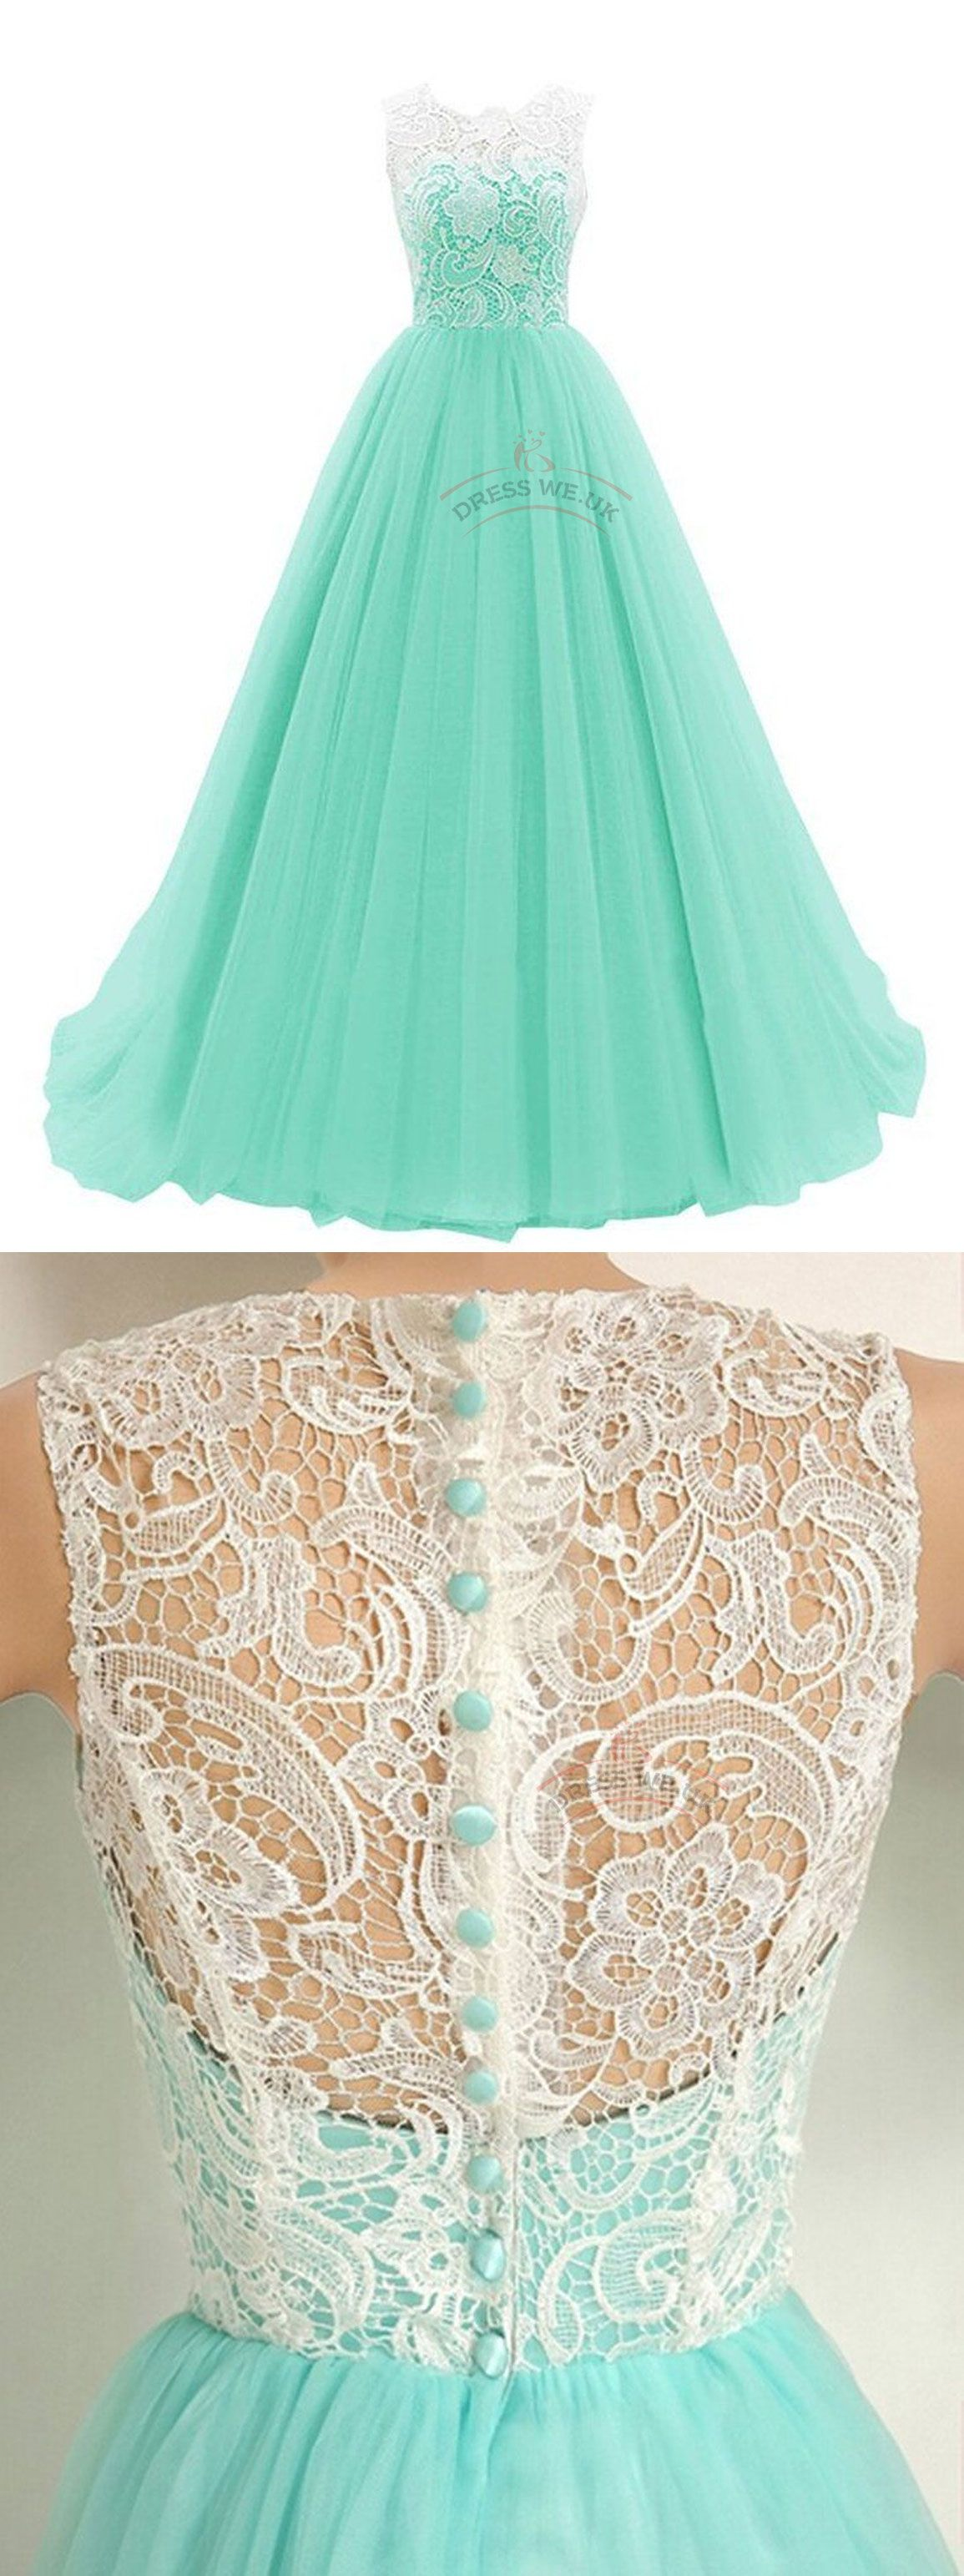 58b3b20ae62 Elegant Mint Prom Dresses